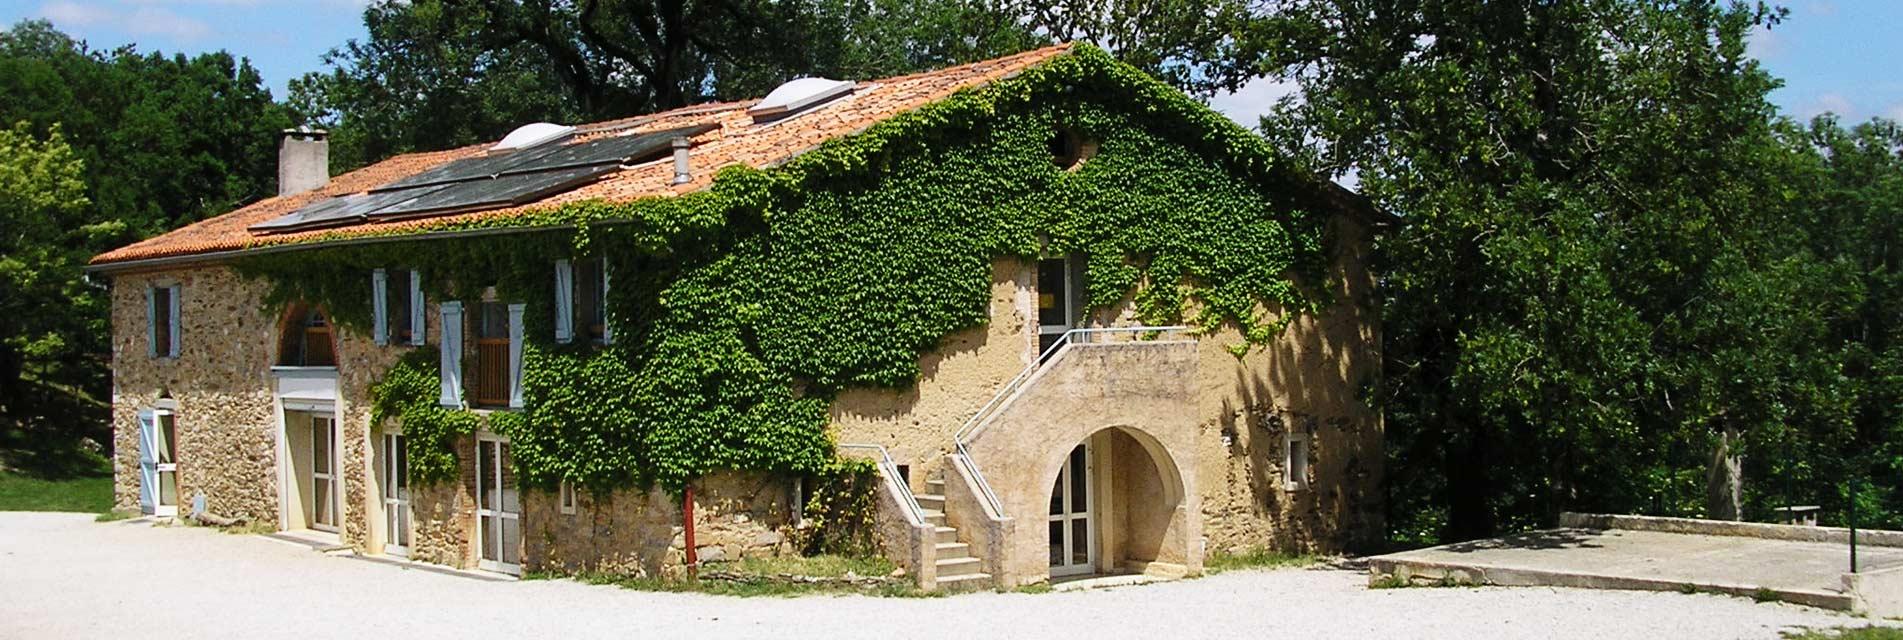 Nos Locations de Vacances en Gîtes de groupe dans le Tarn en Occitanie